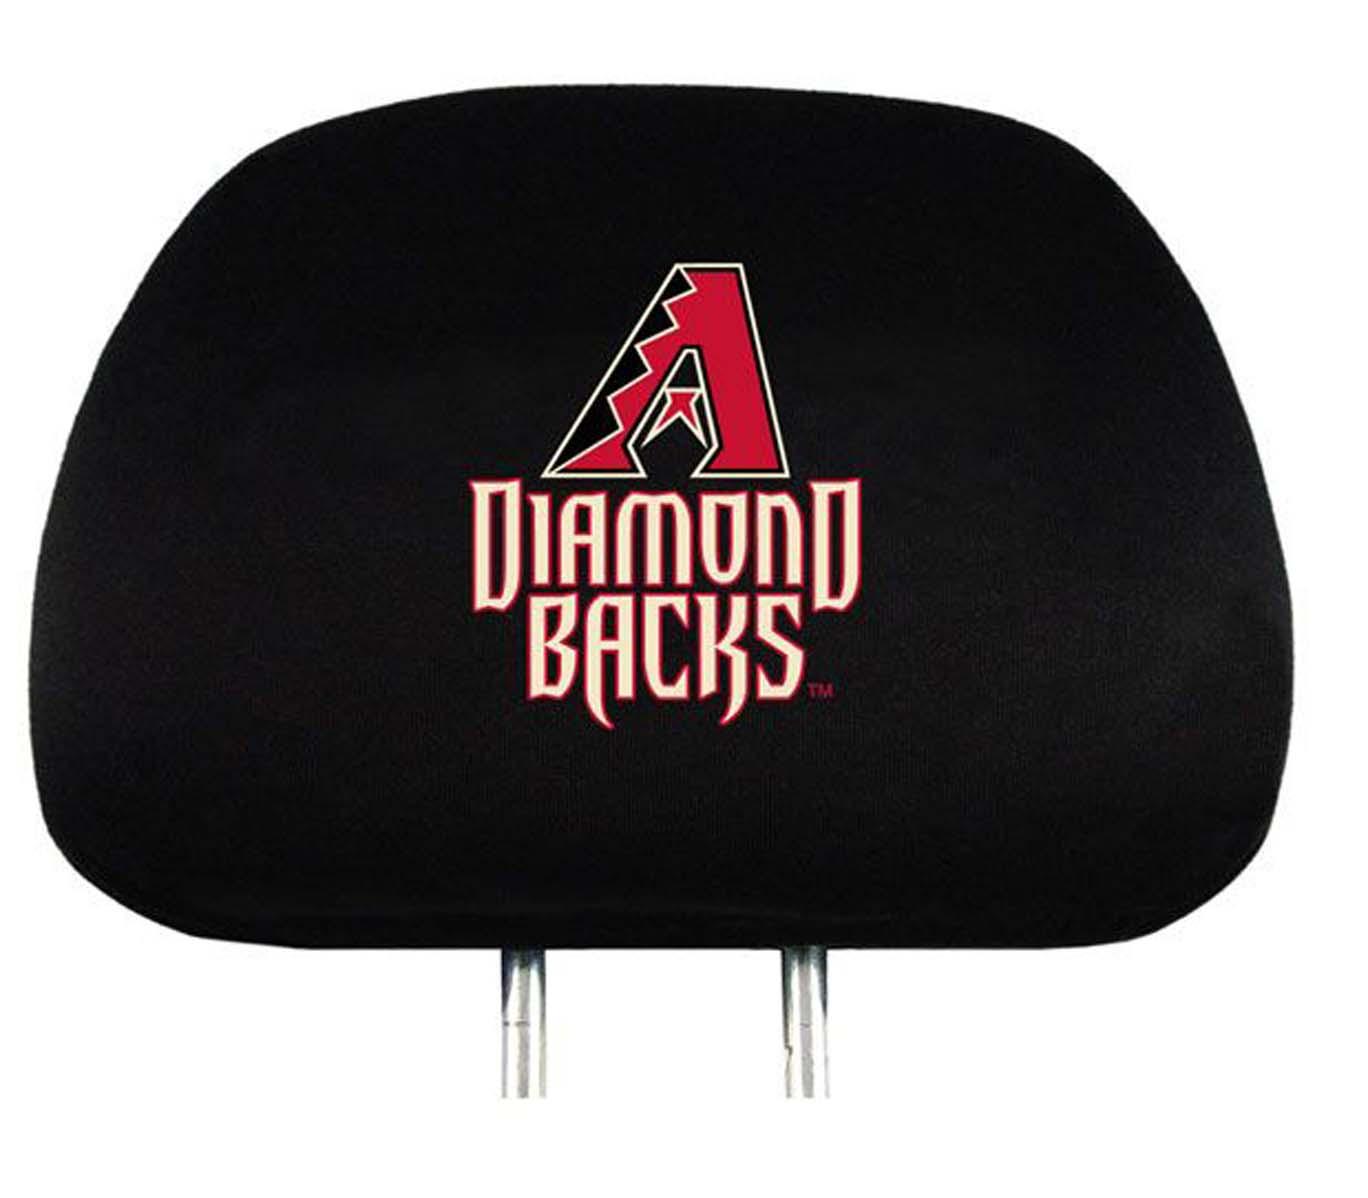 Arizona Diamondbacks Head Rest Covers - Set of 2